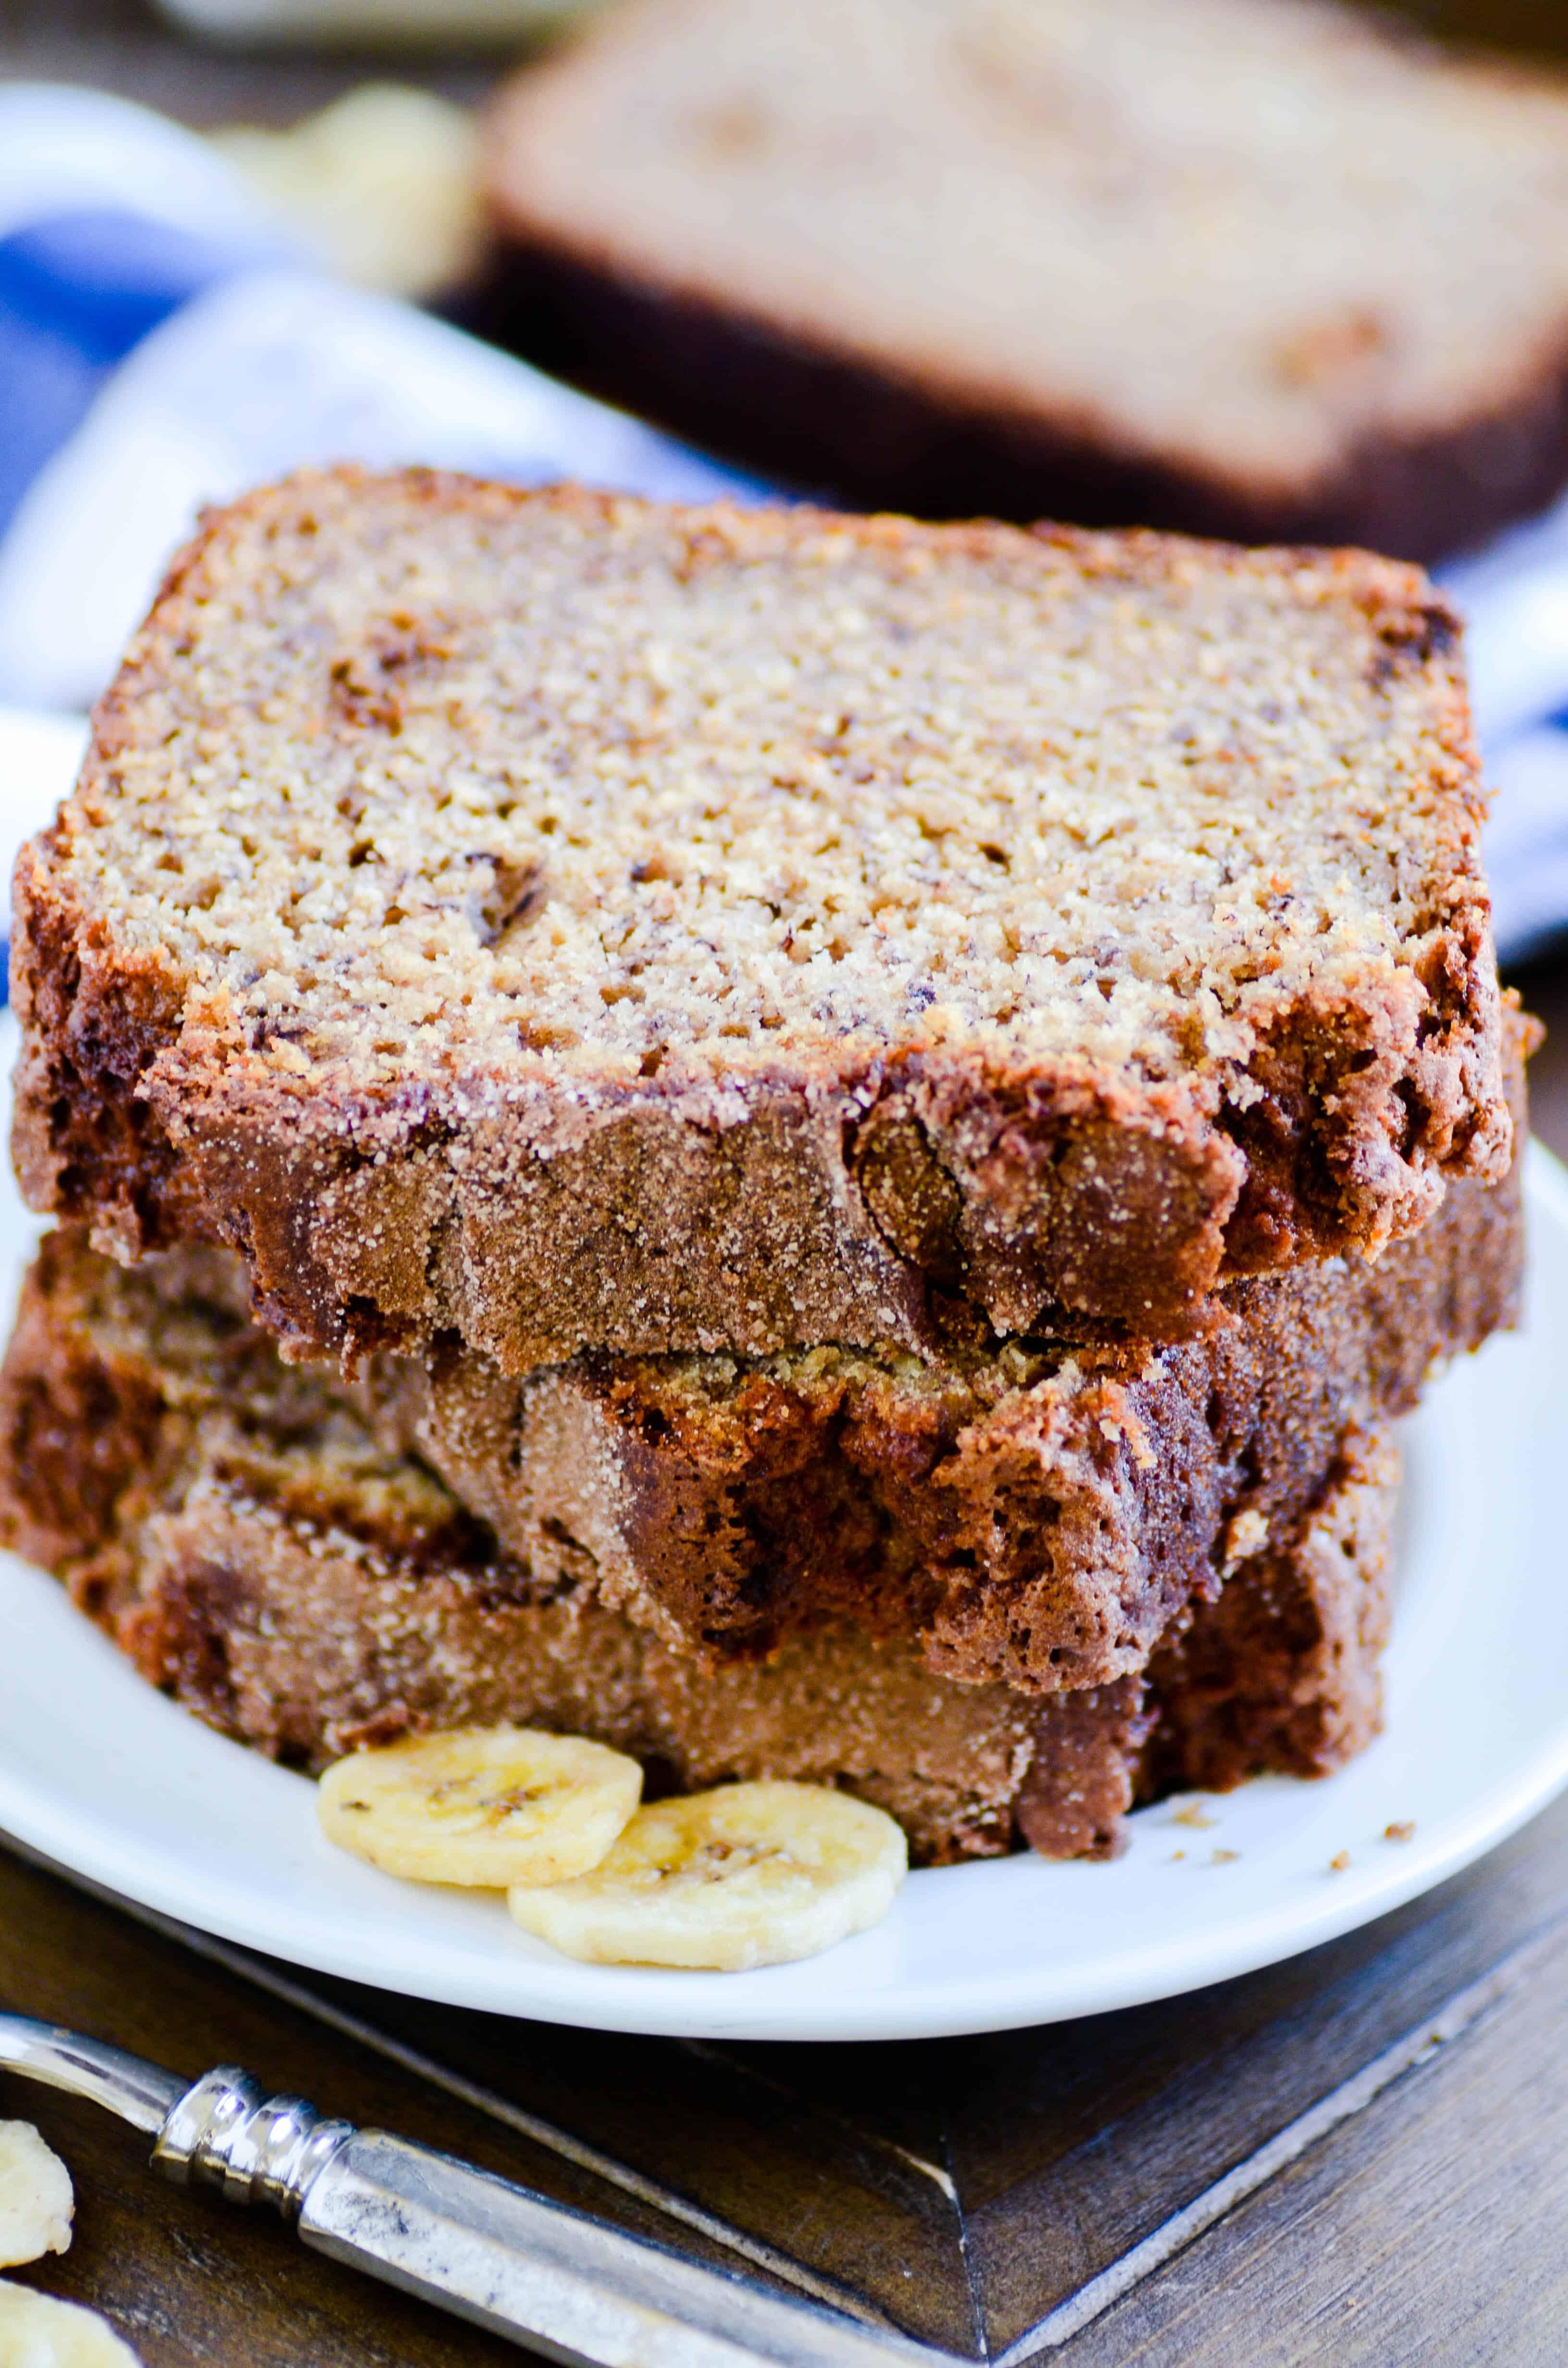 Whole Grain Banana Bread - The 2018 Recipe of the Year